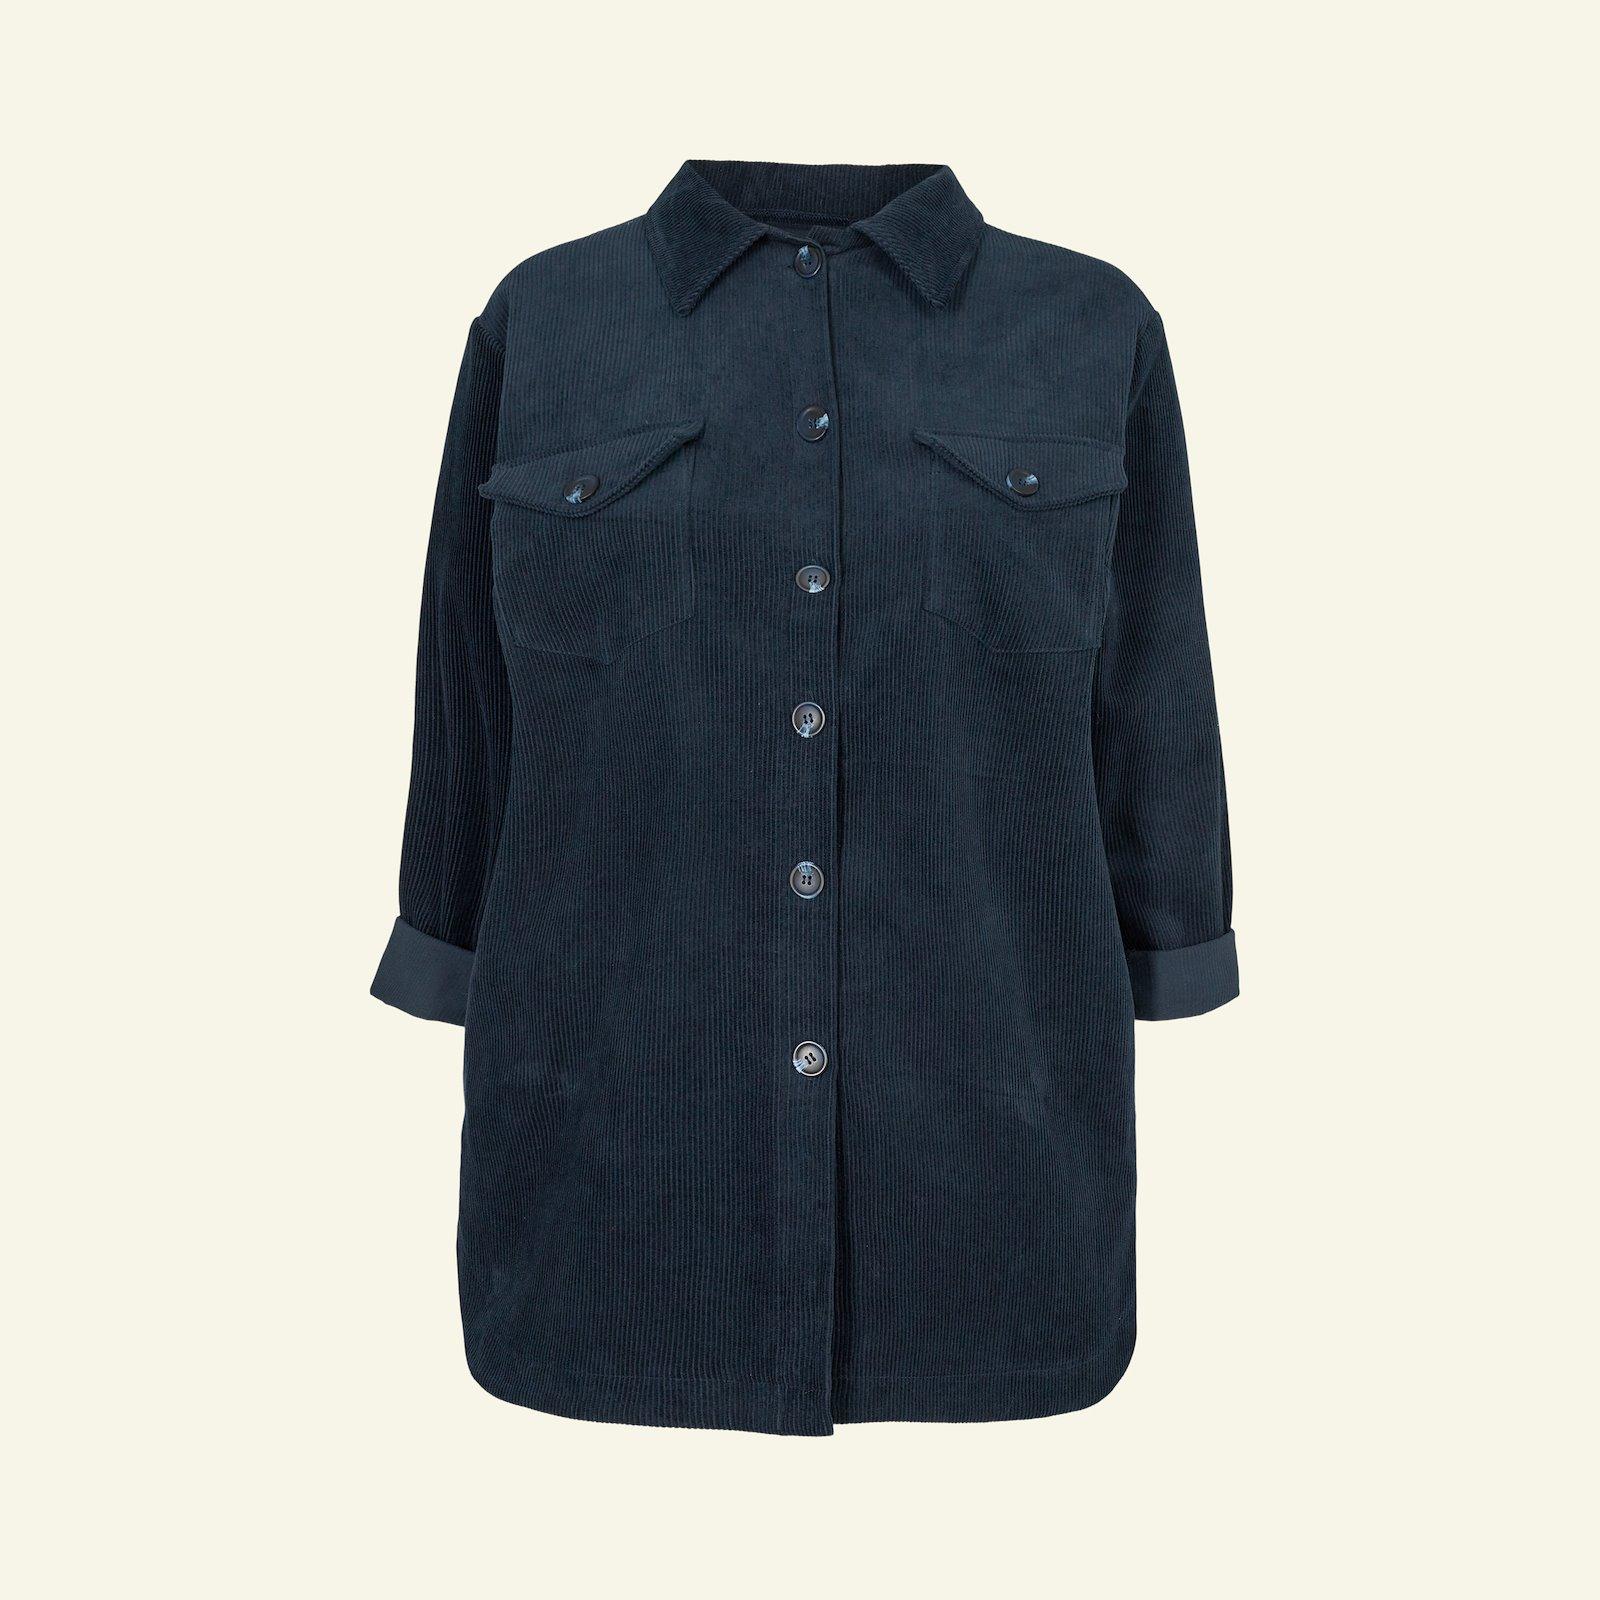 Shirt jacket p74001_430305_33118_sskit